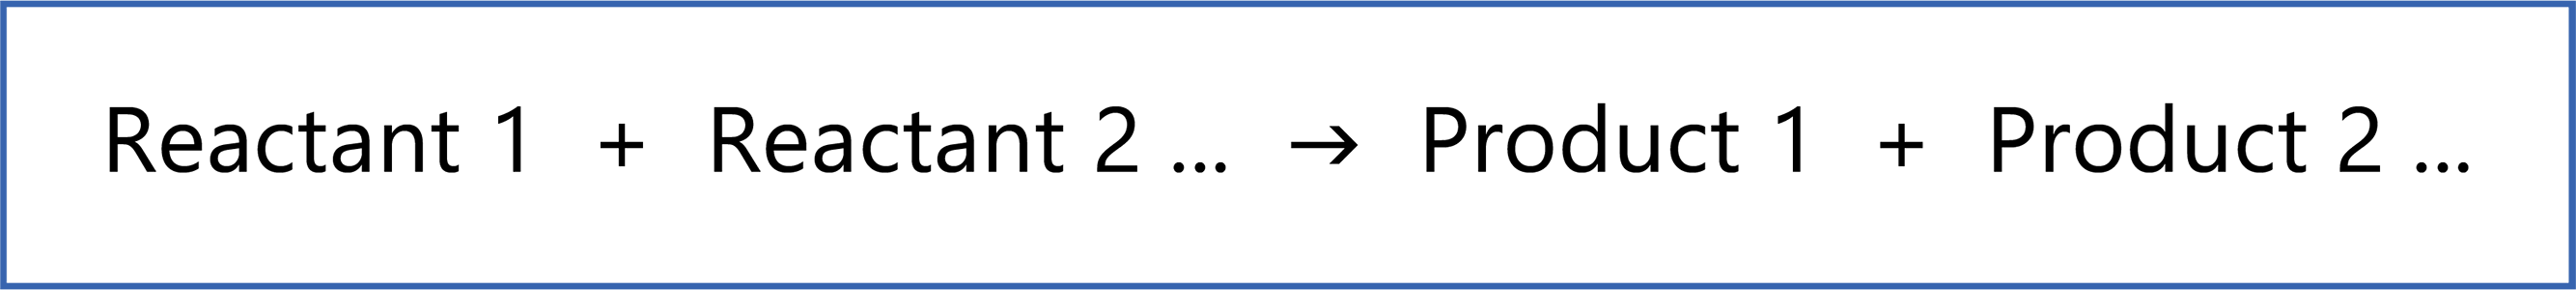 chemical reaction general formula reactants products